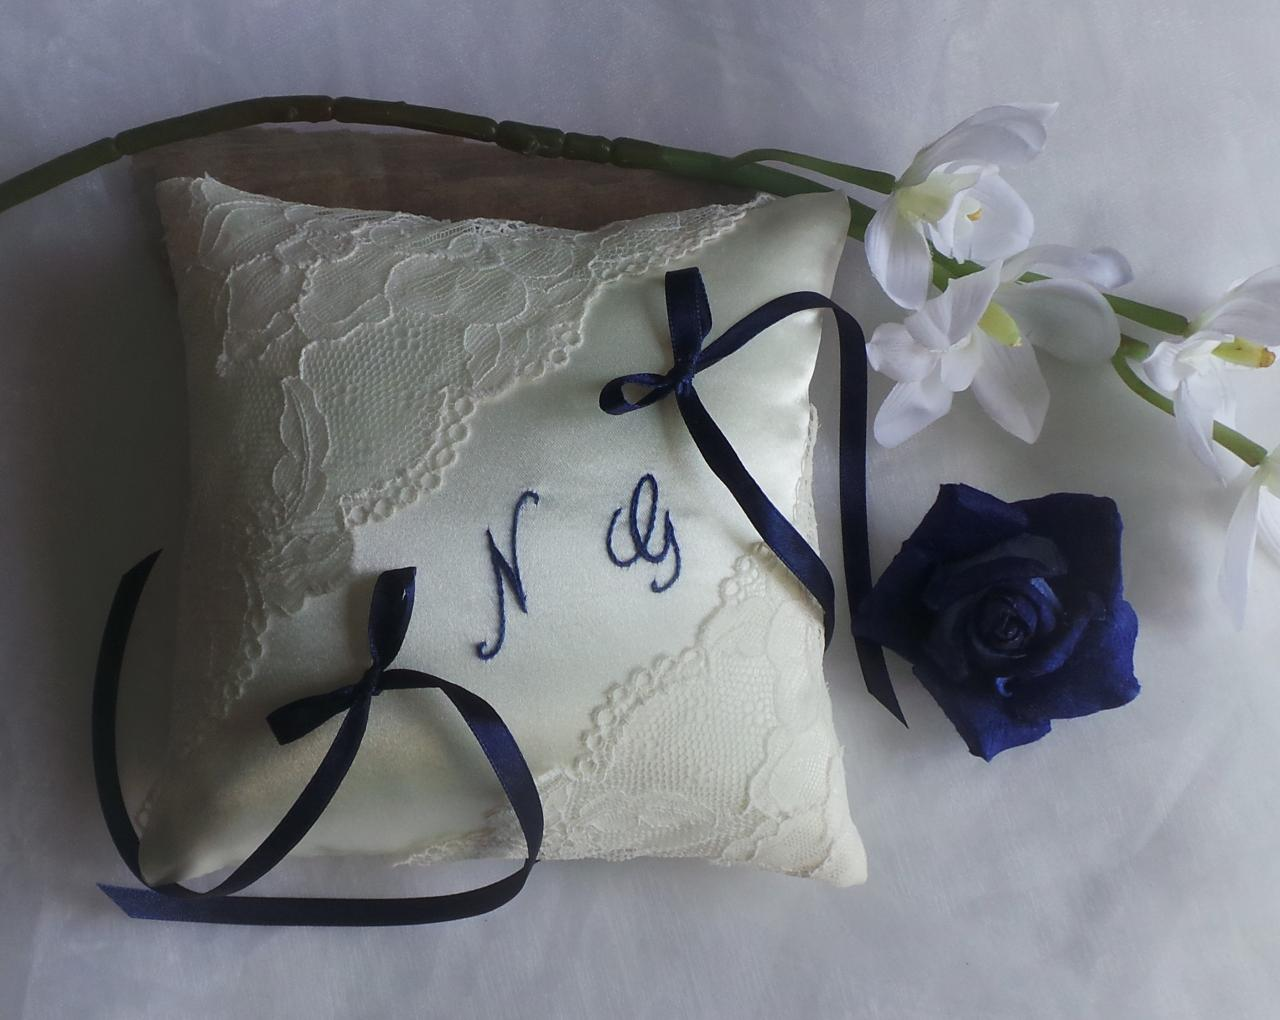 coussin dentelle ivoire bleu marine